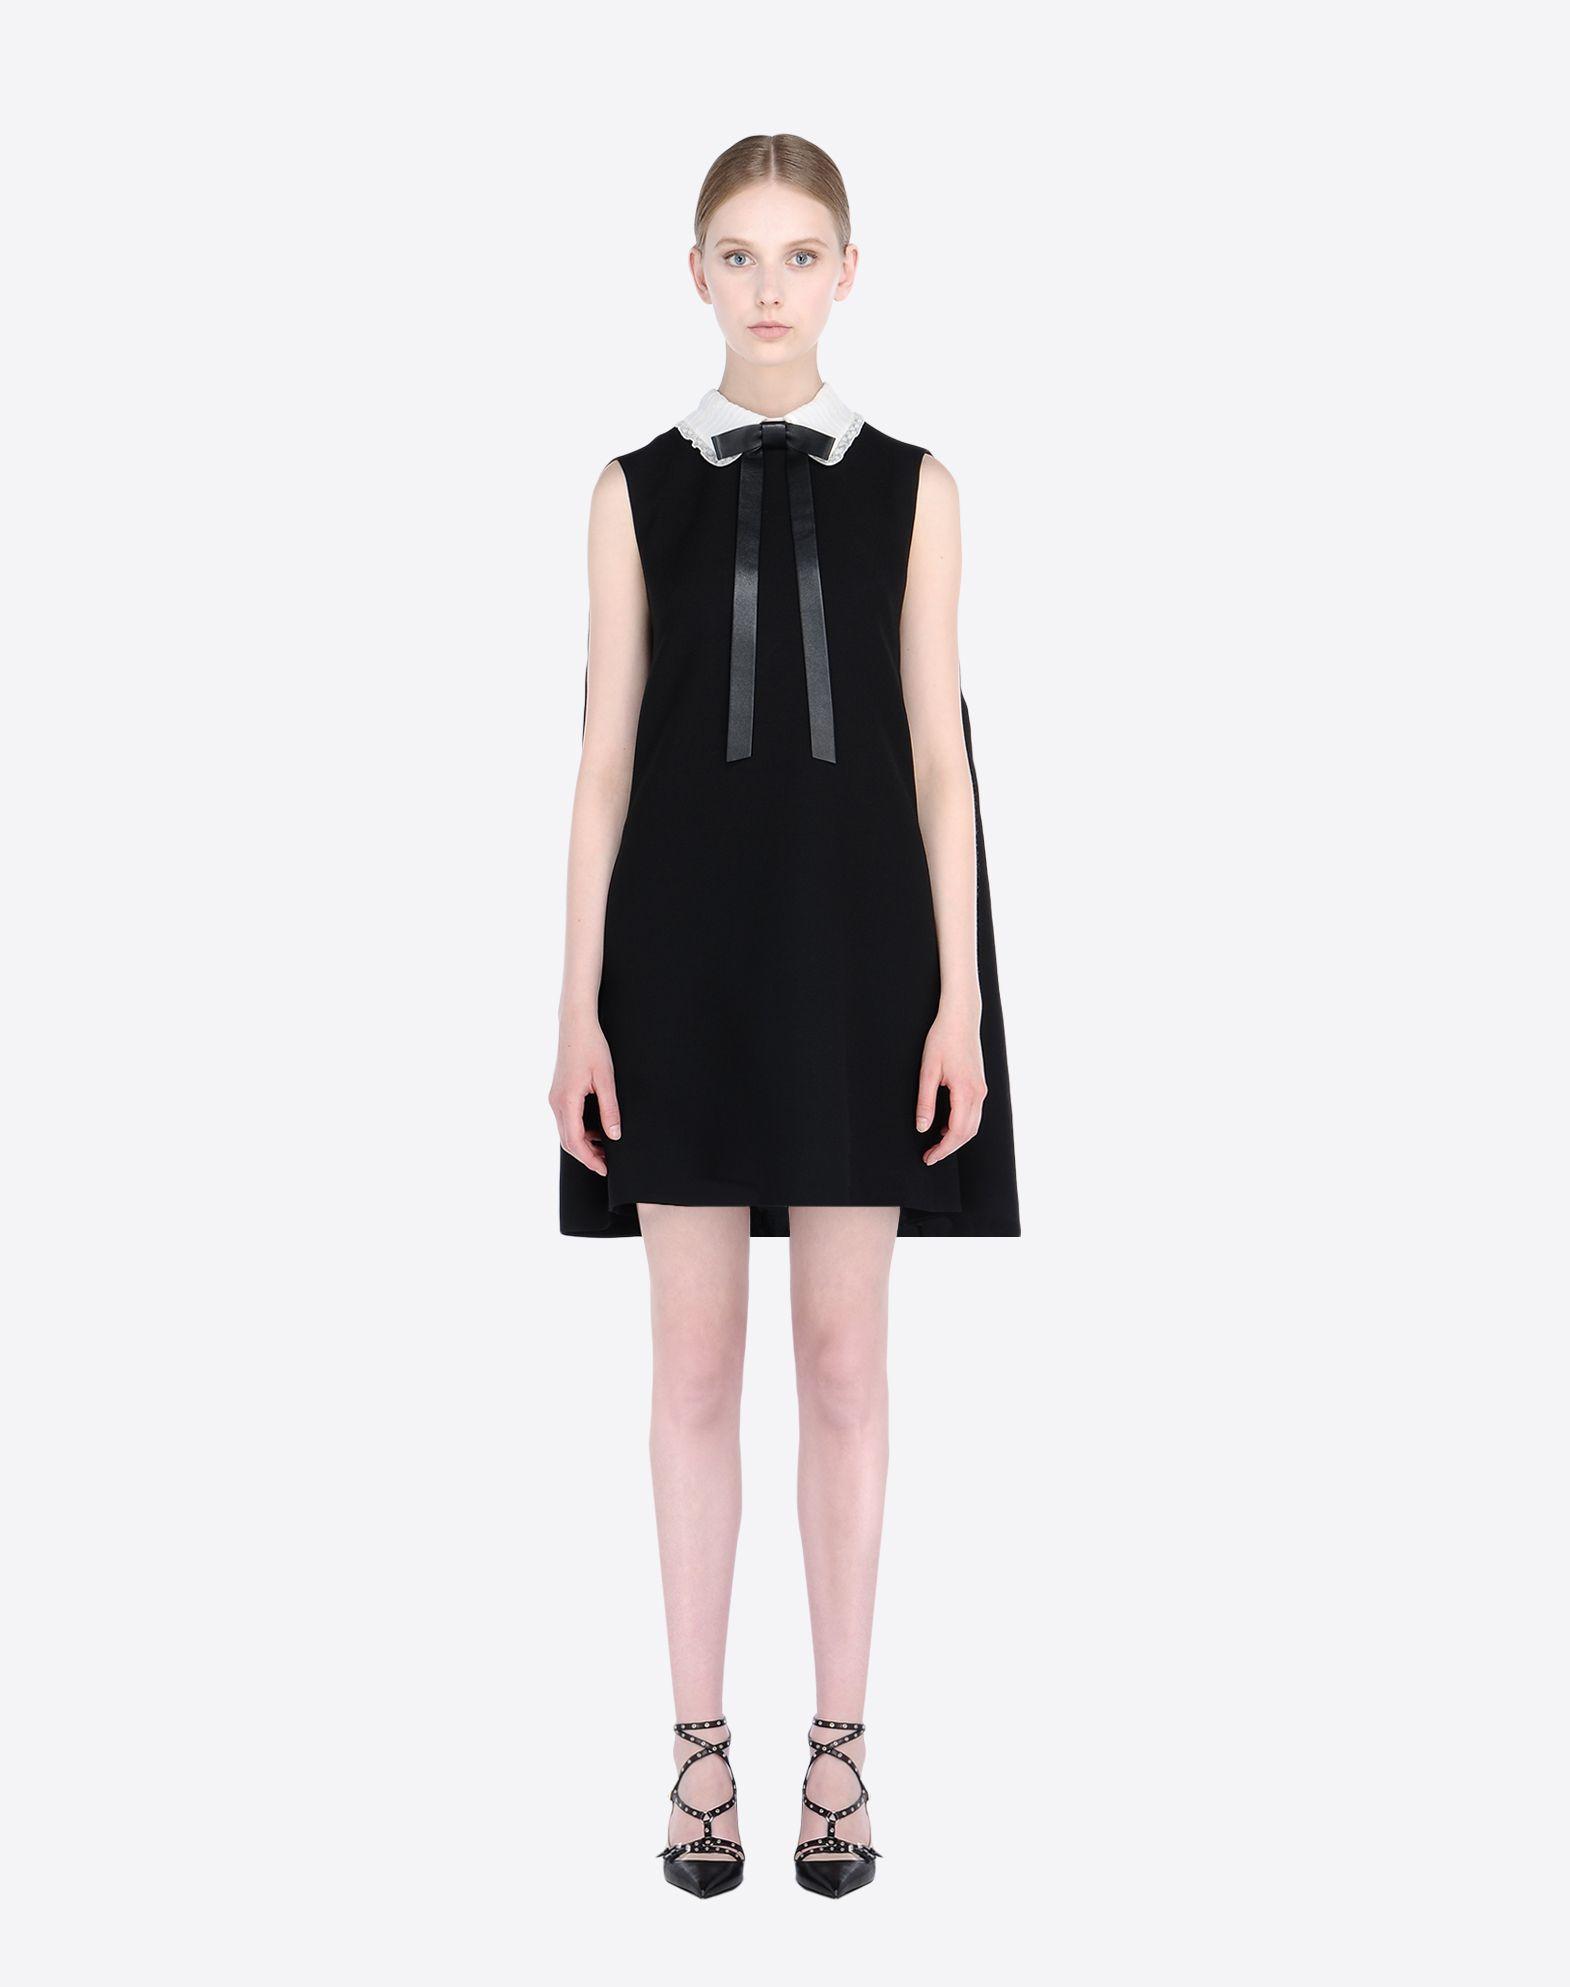 913a43f4d3 Valentino White Cape Dress